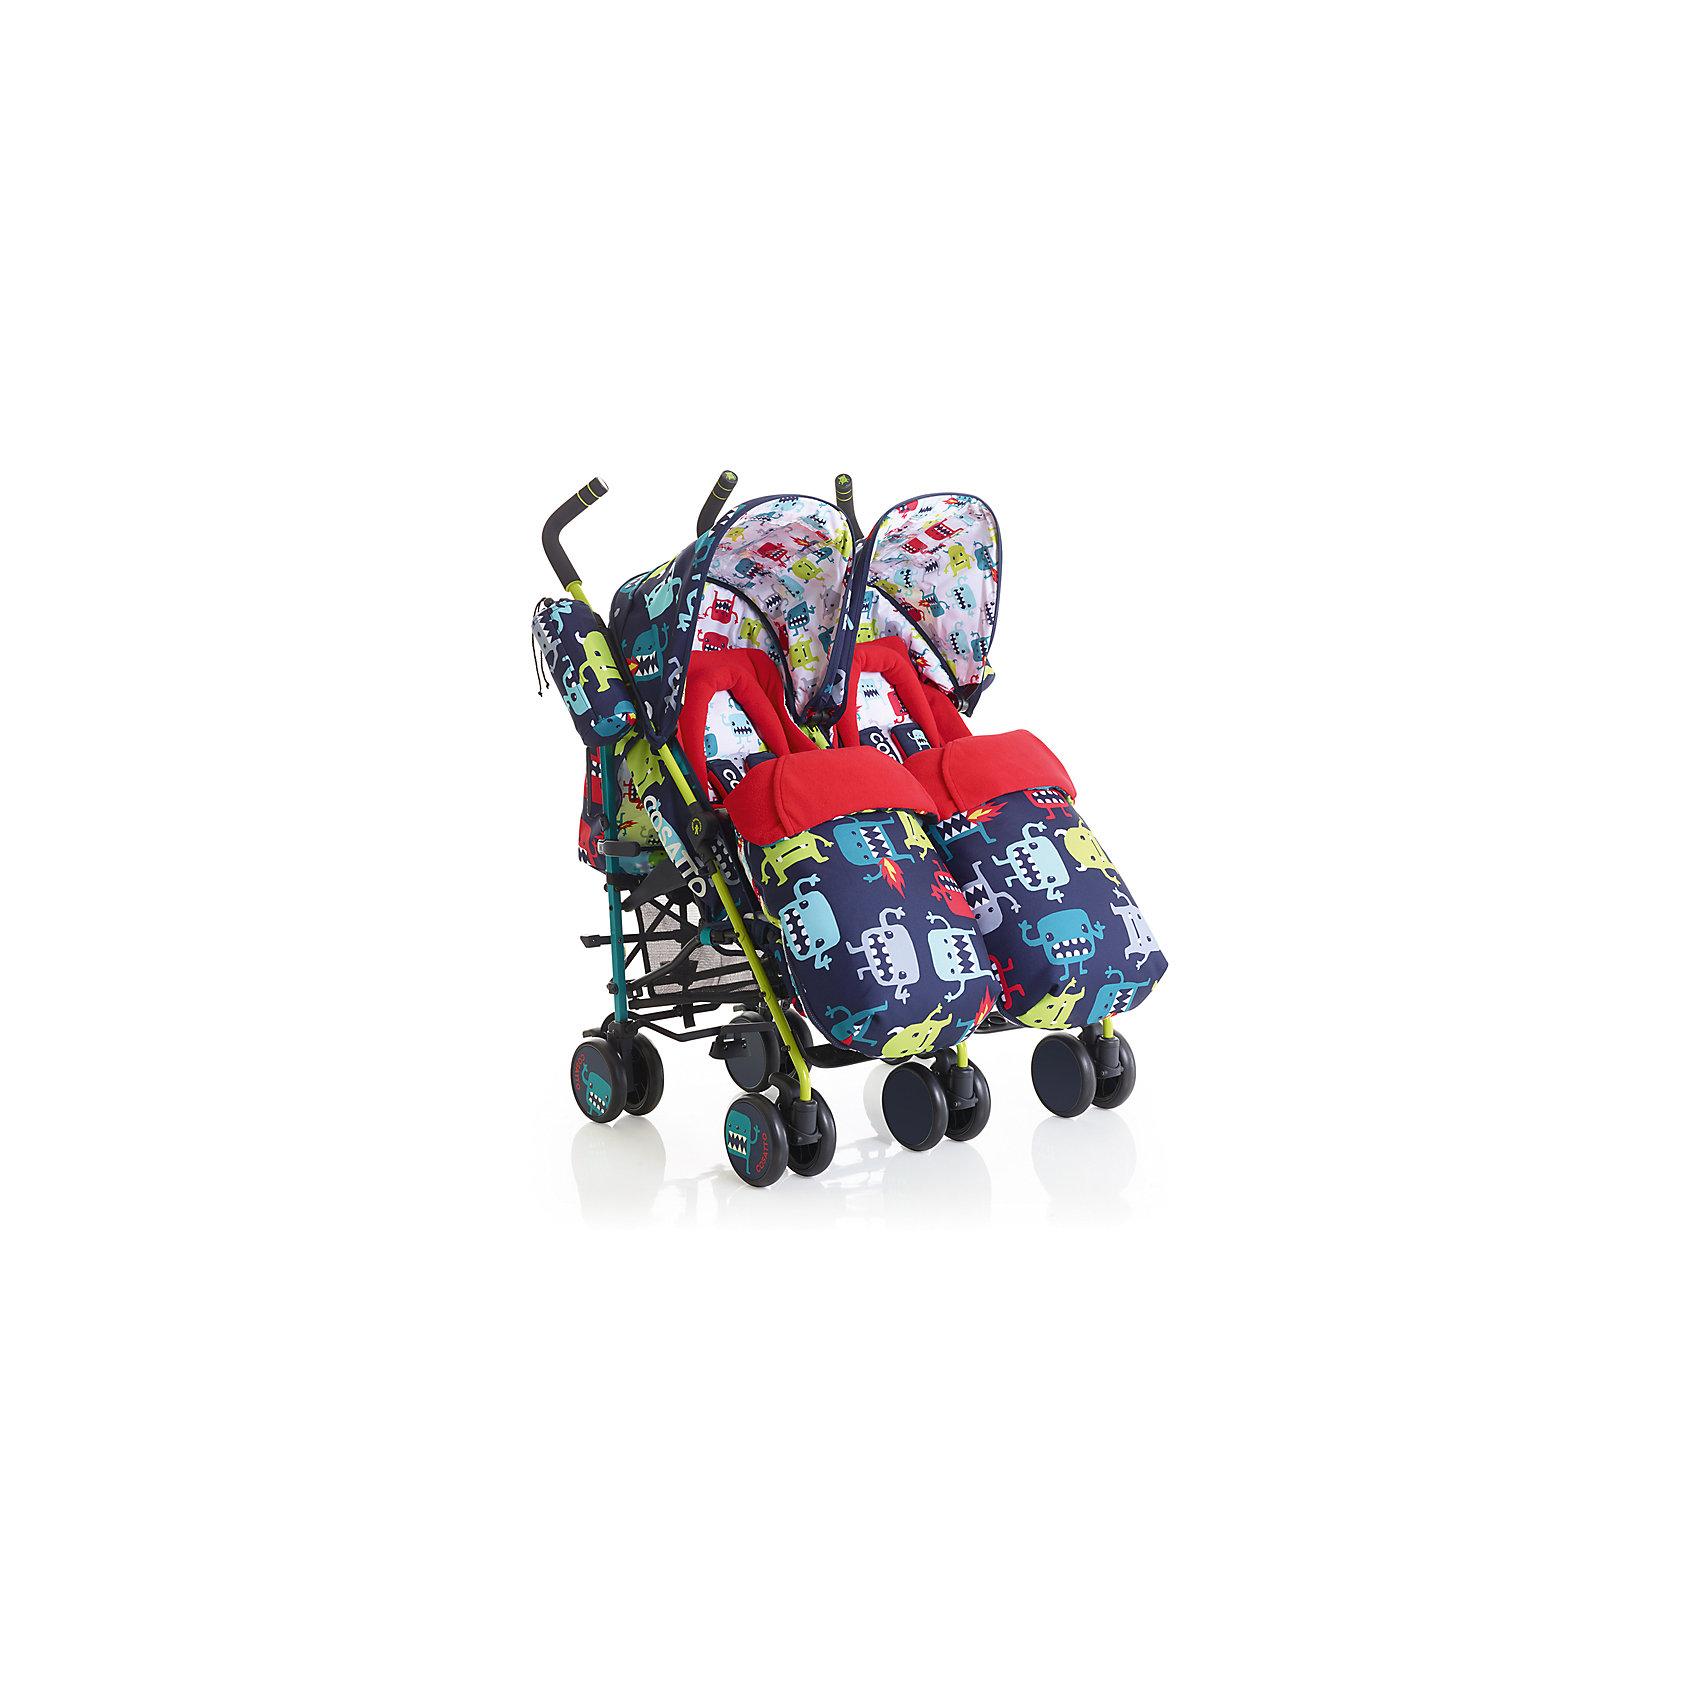 COSATTO Прогулочная коляска для двойни SUPA DUPA TWIN, Cosatto, Cuddle Monster 2 цены онлайн